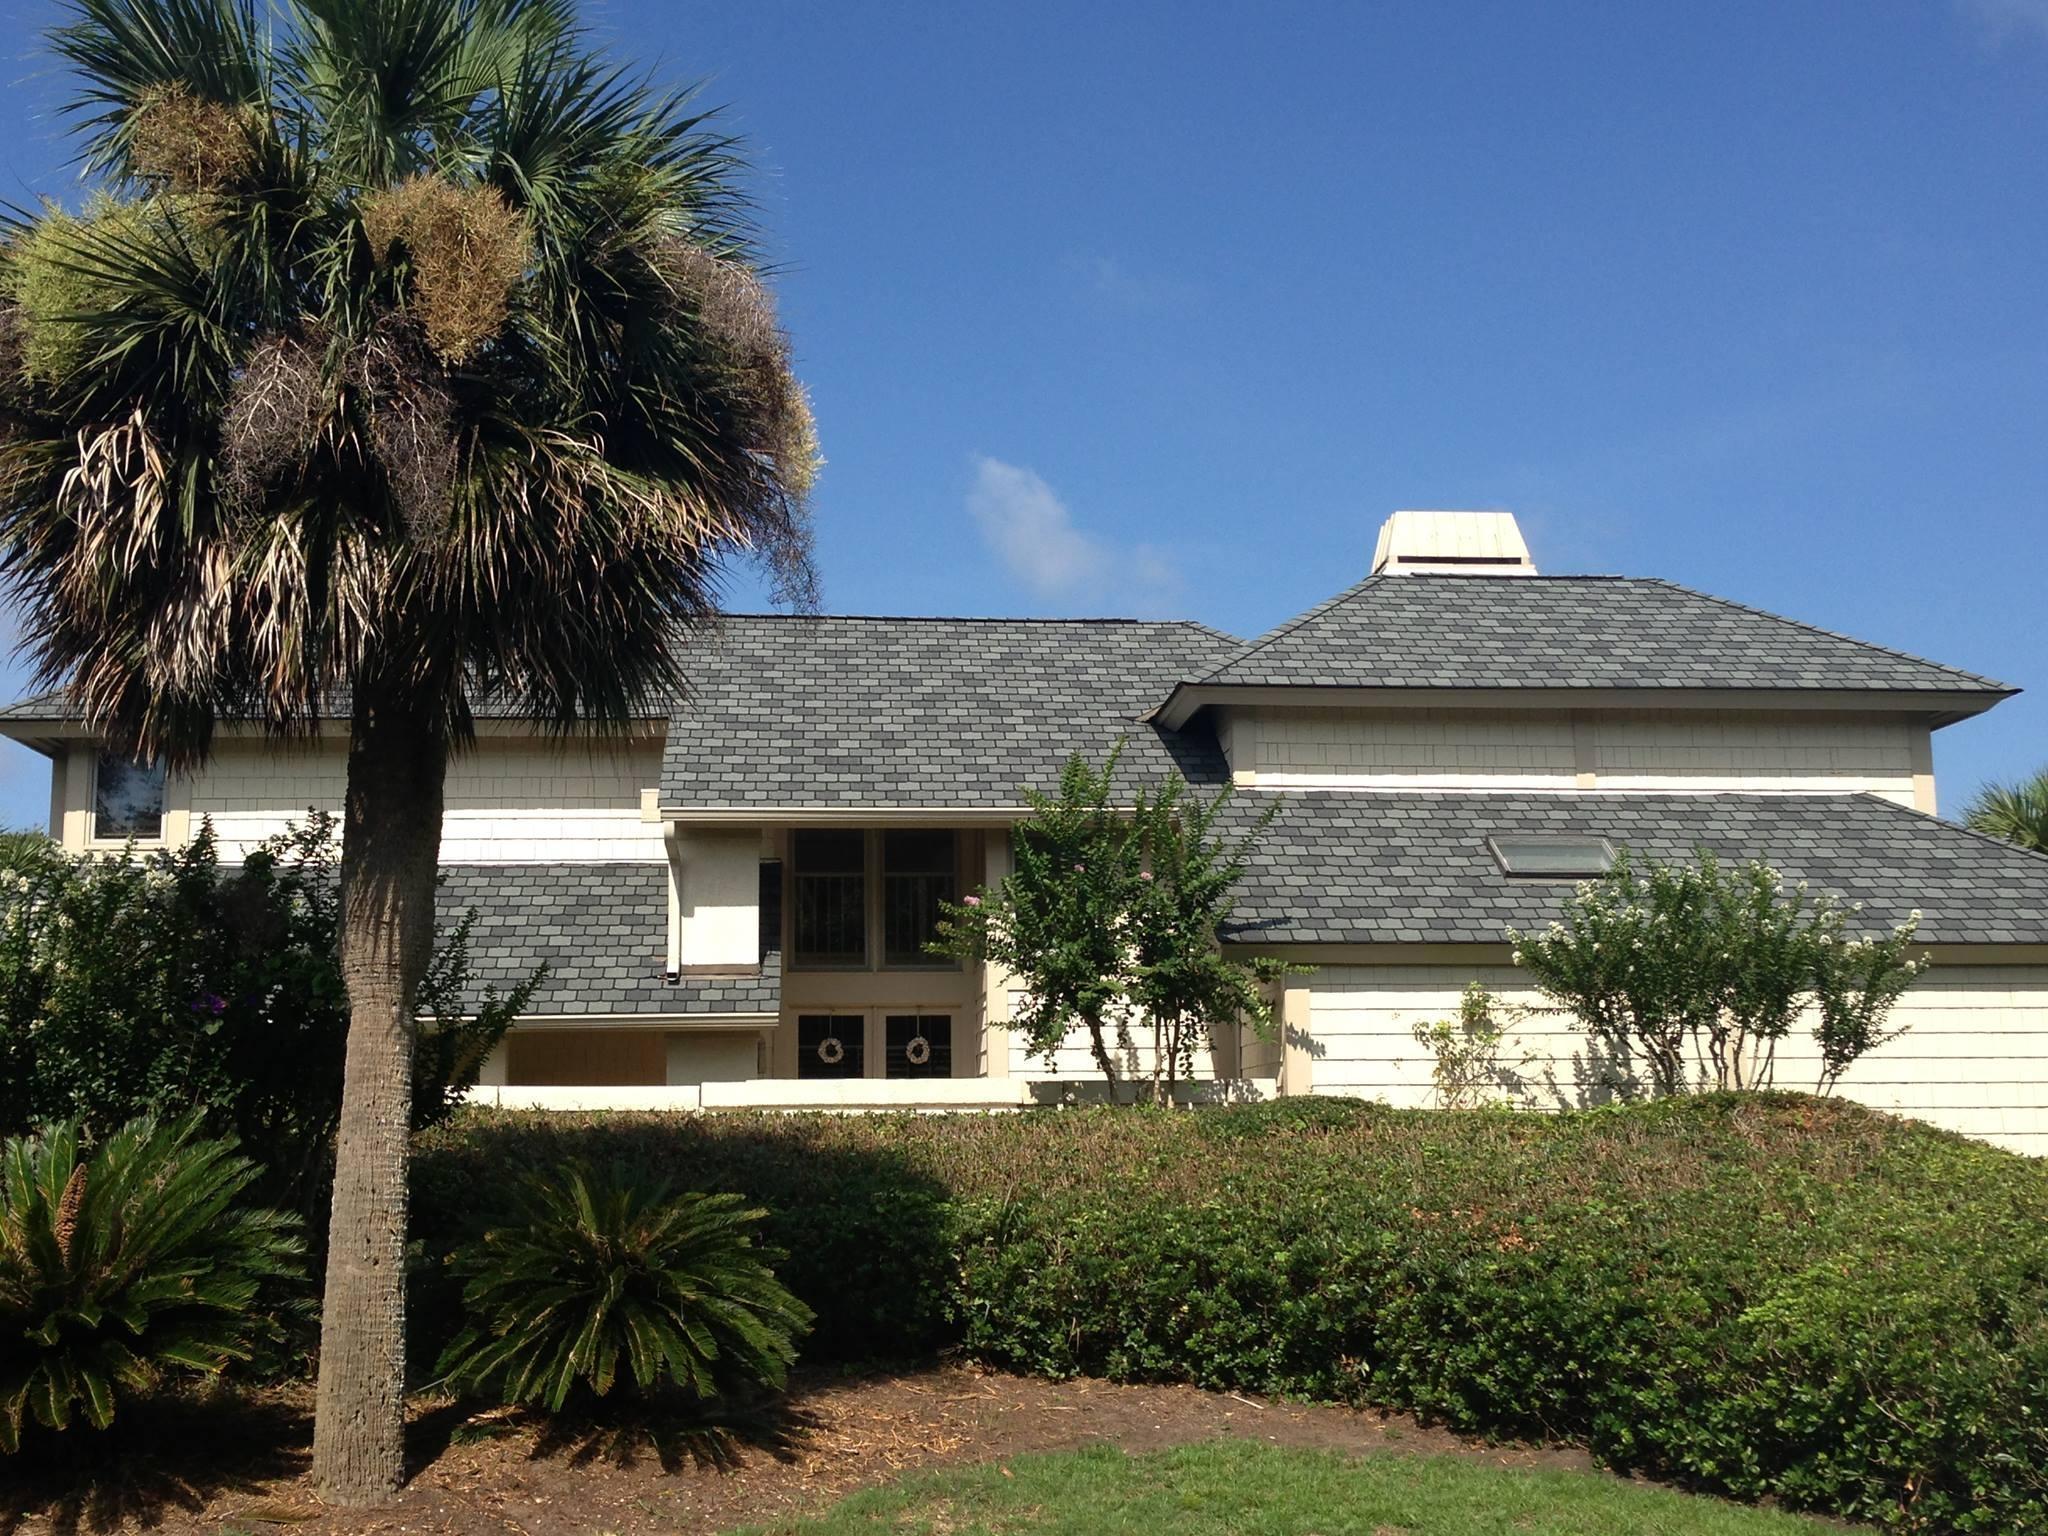 RoofCrafters-Savannah image 20